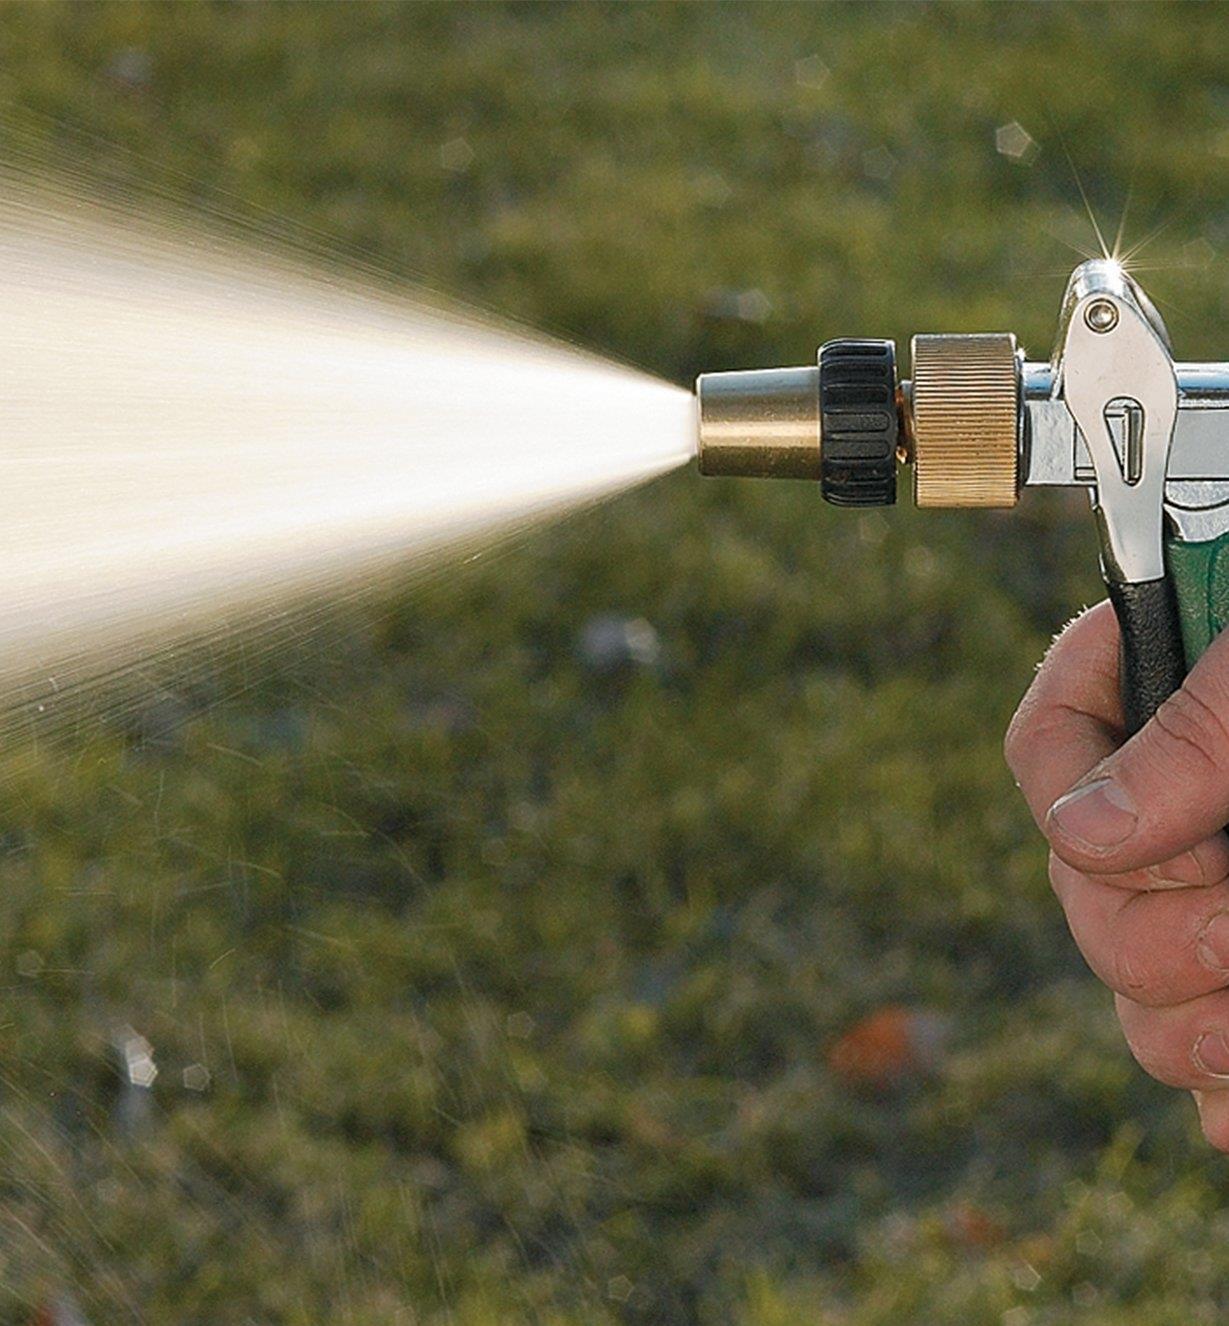 Water Gun spraying with the medium setting